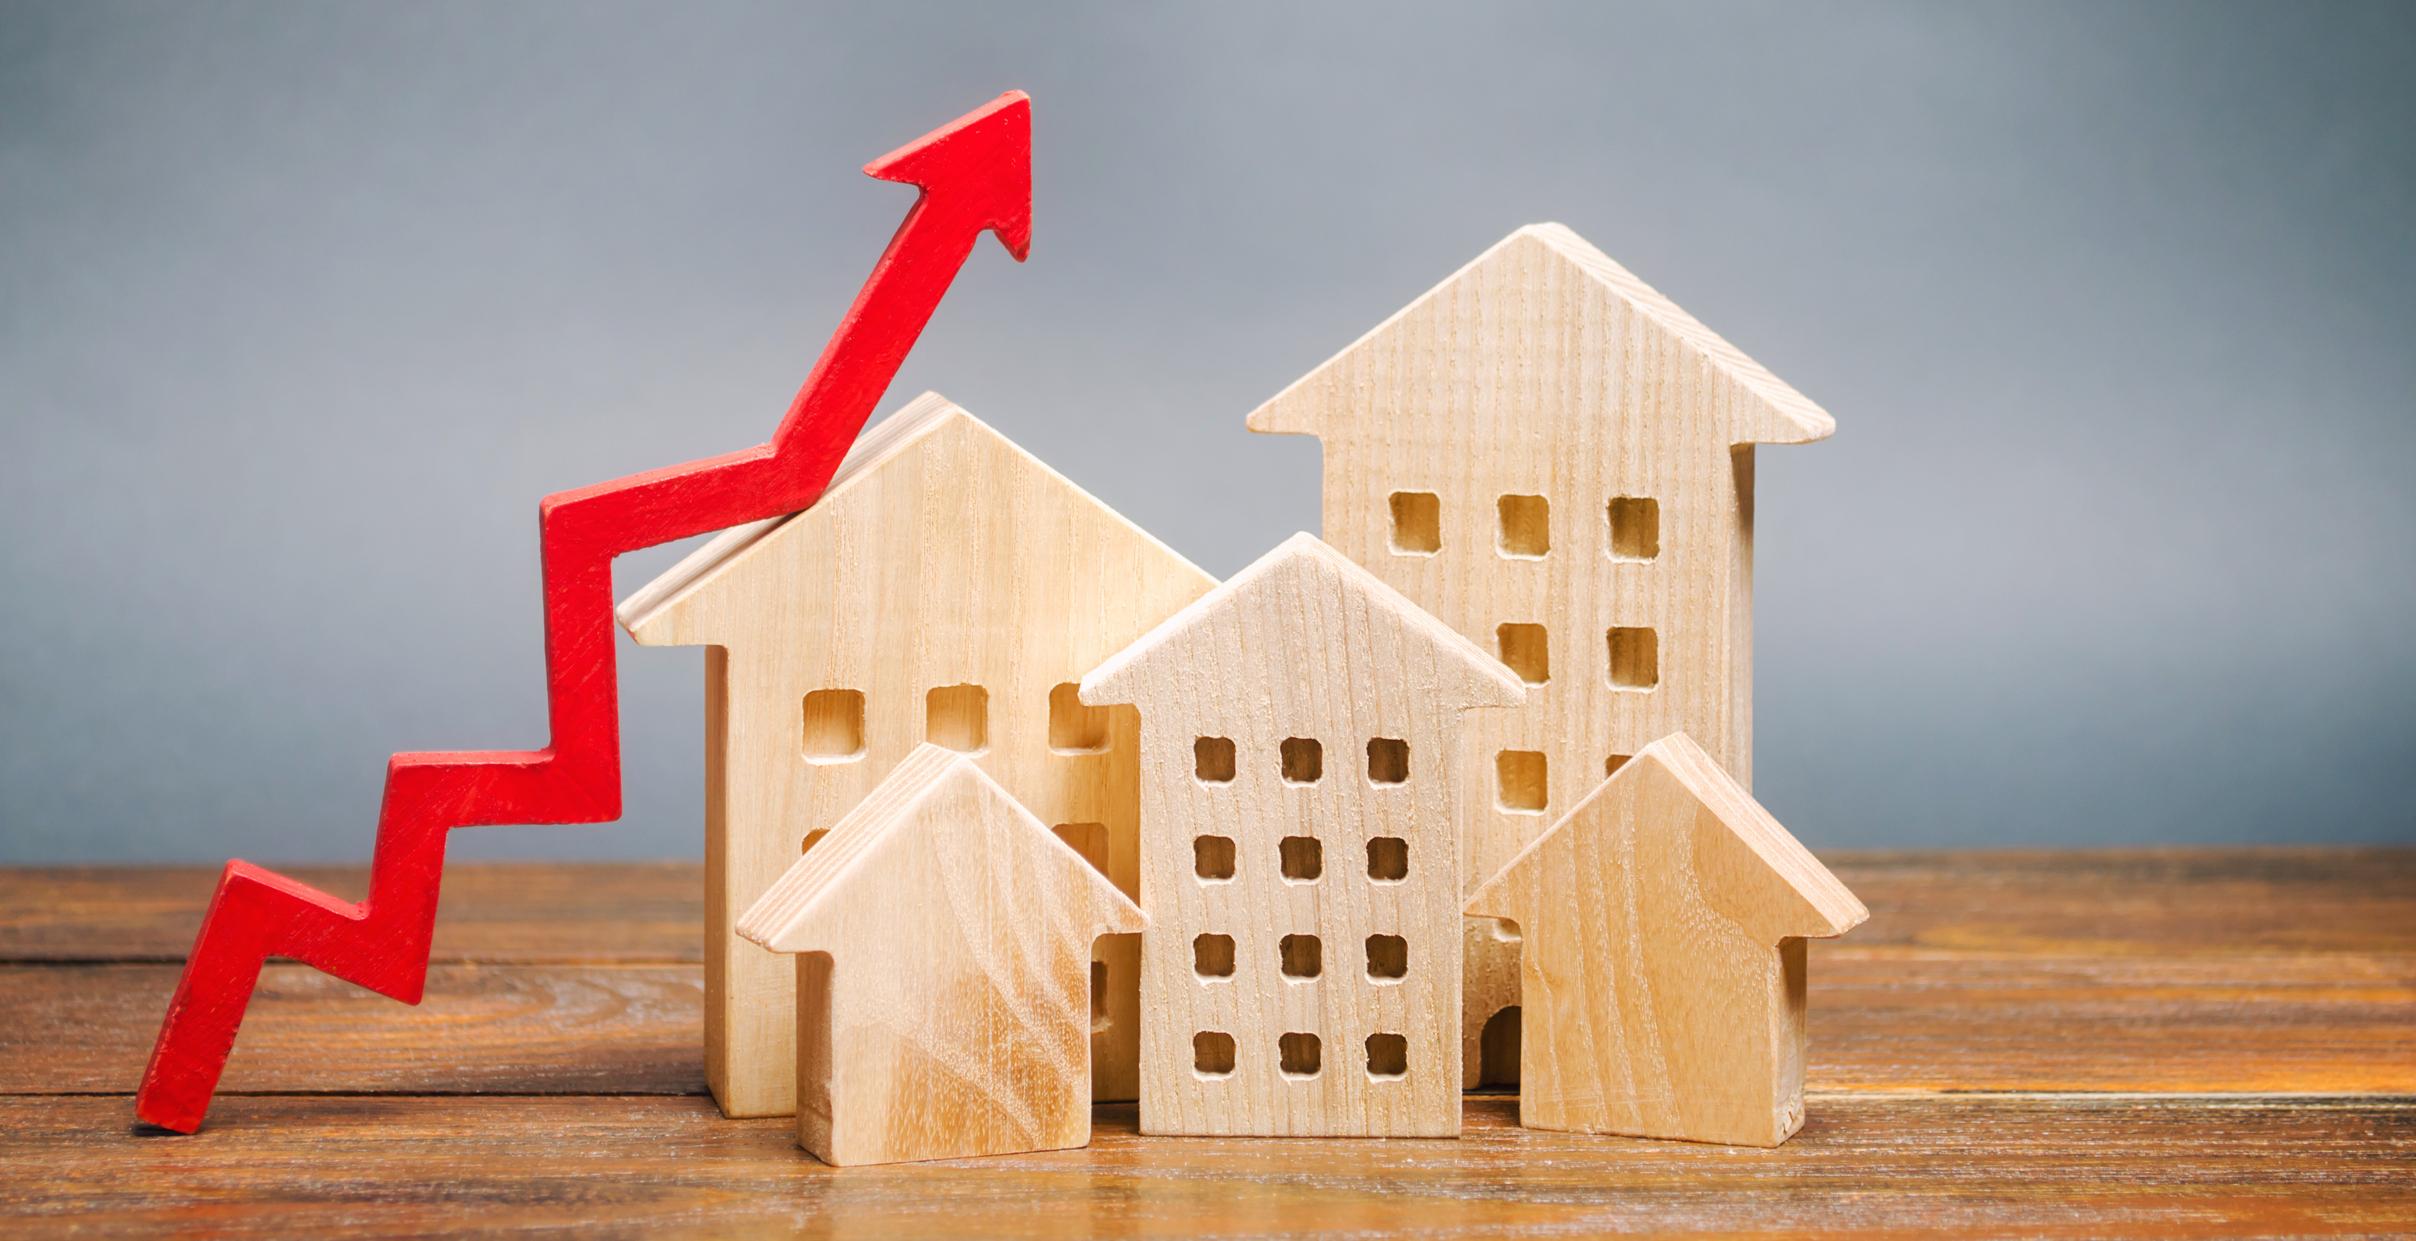 Bieterverfahren für Immobilien: hohe Verkaufssummen